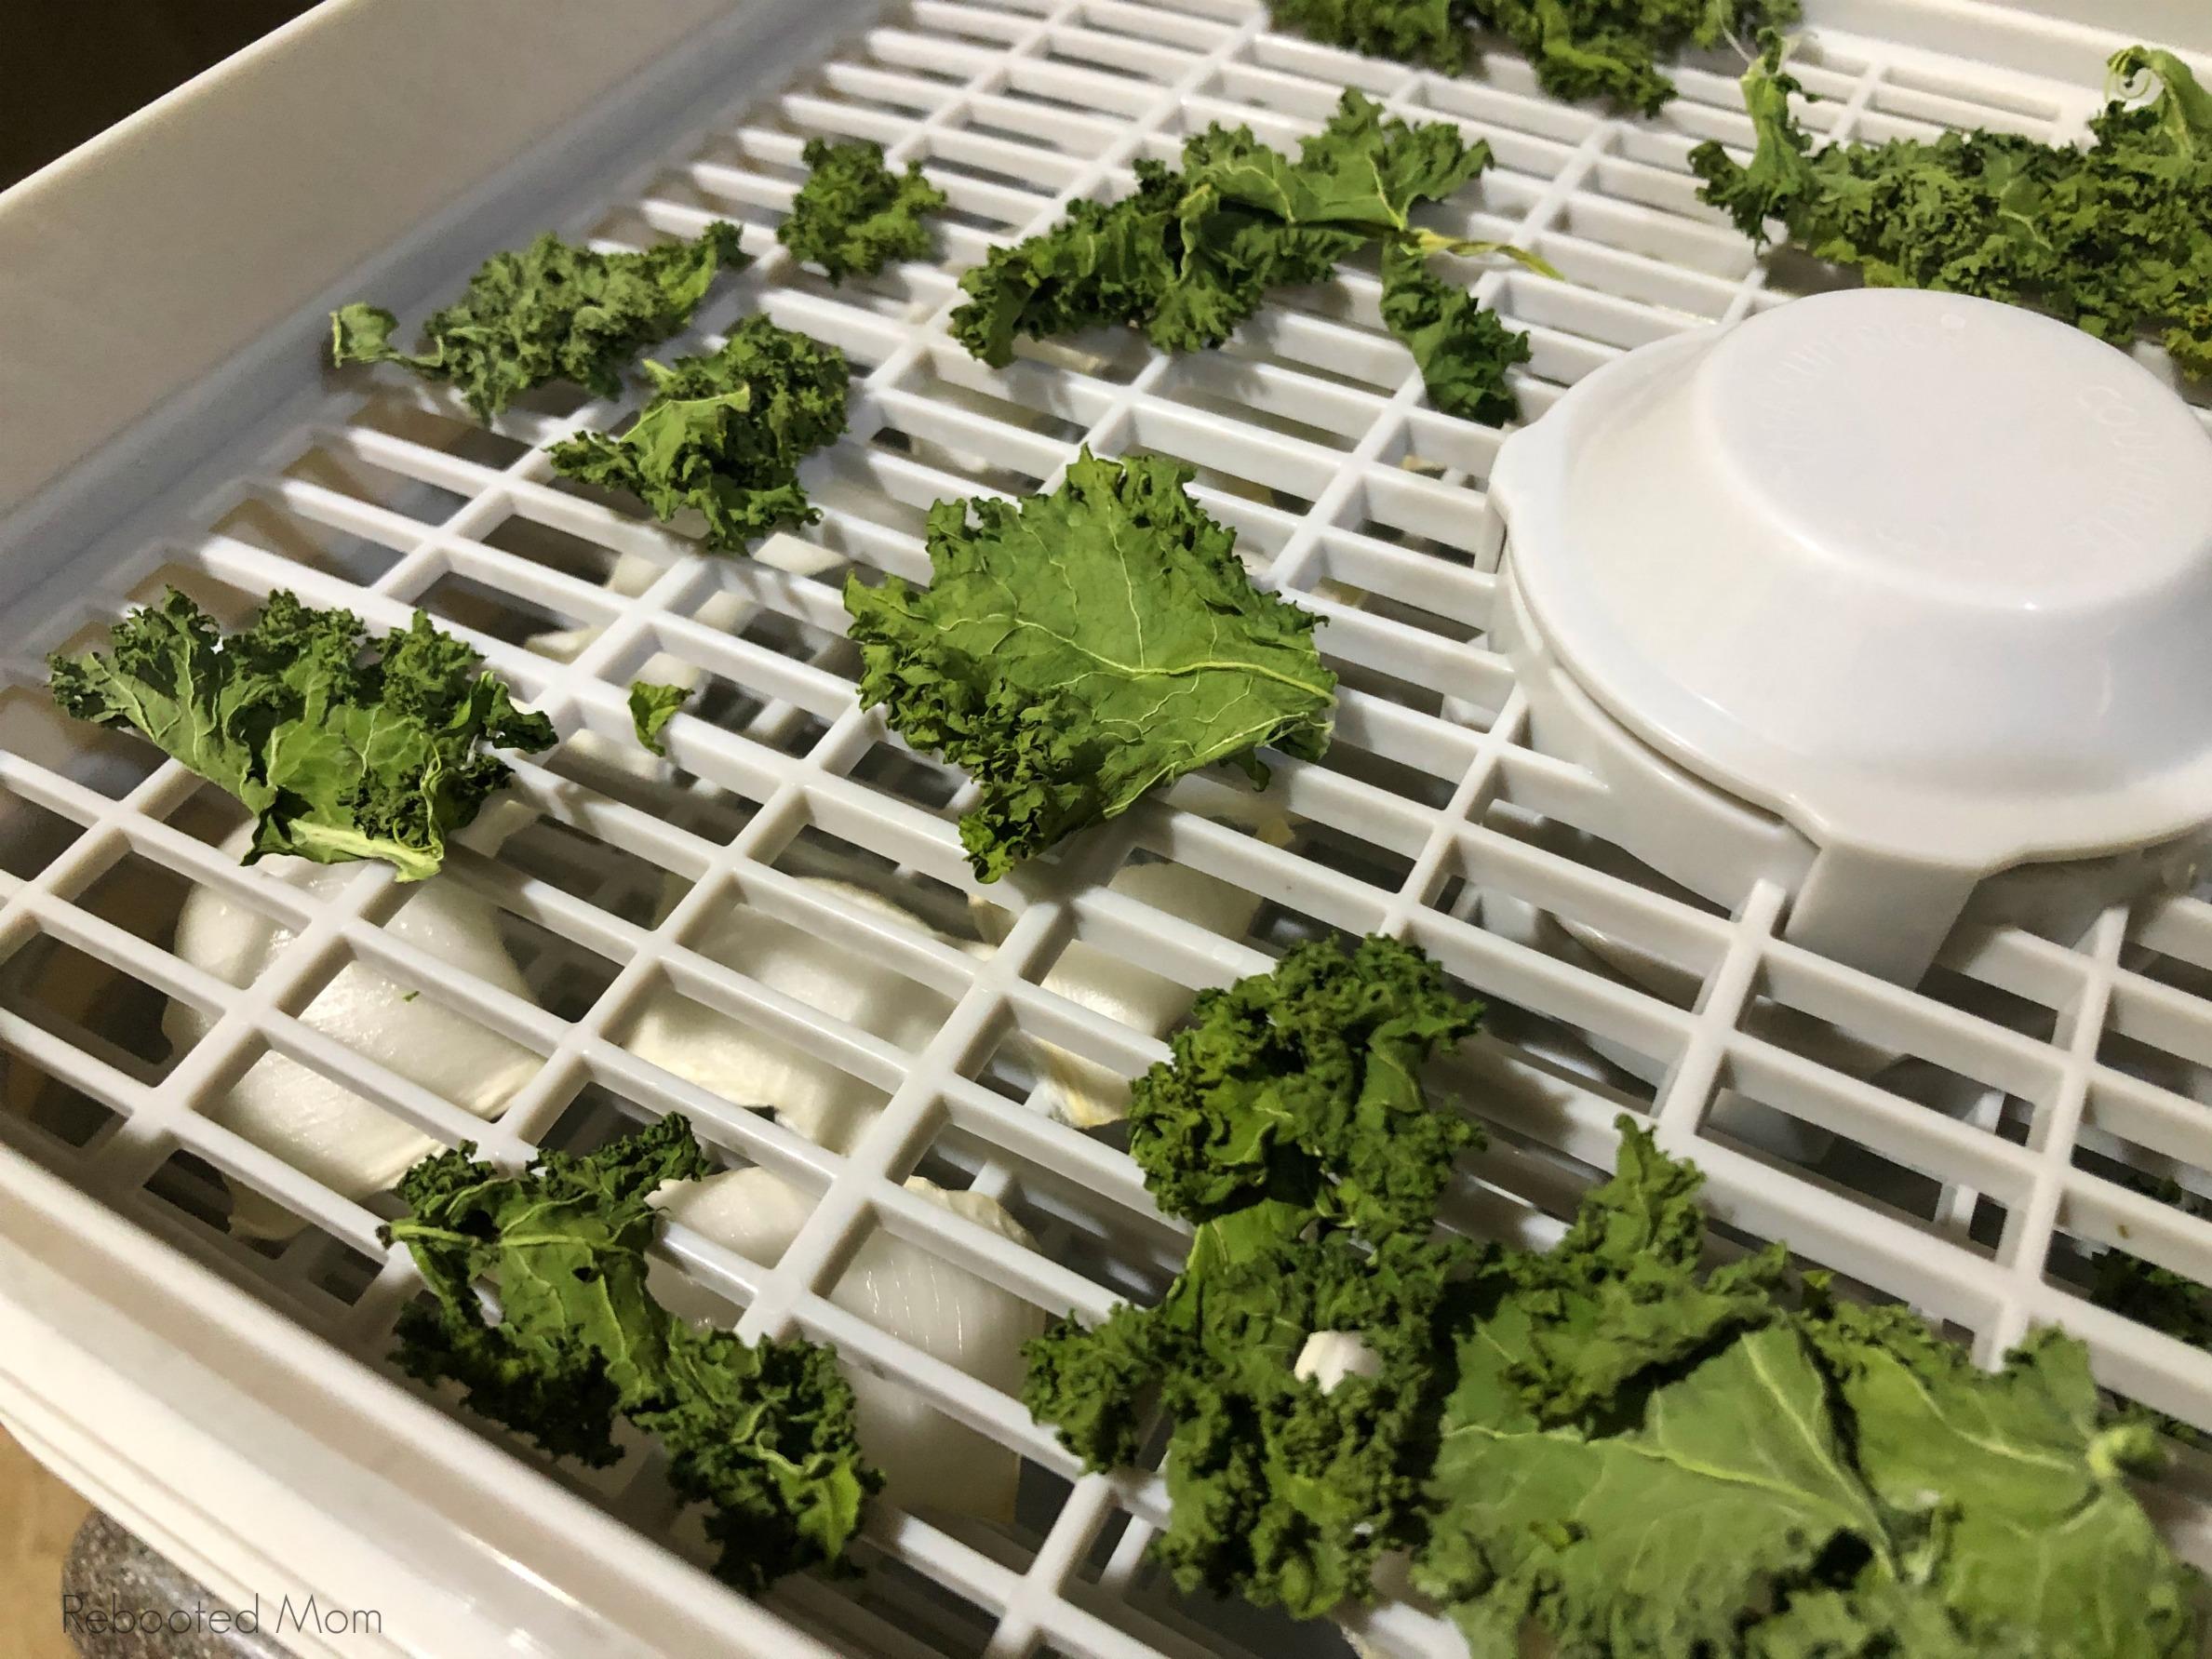 Kale on a Dehydrator Tray